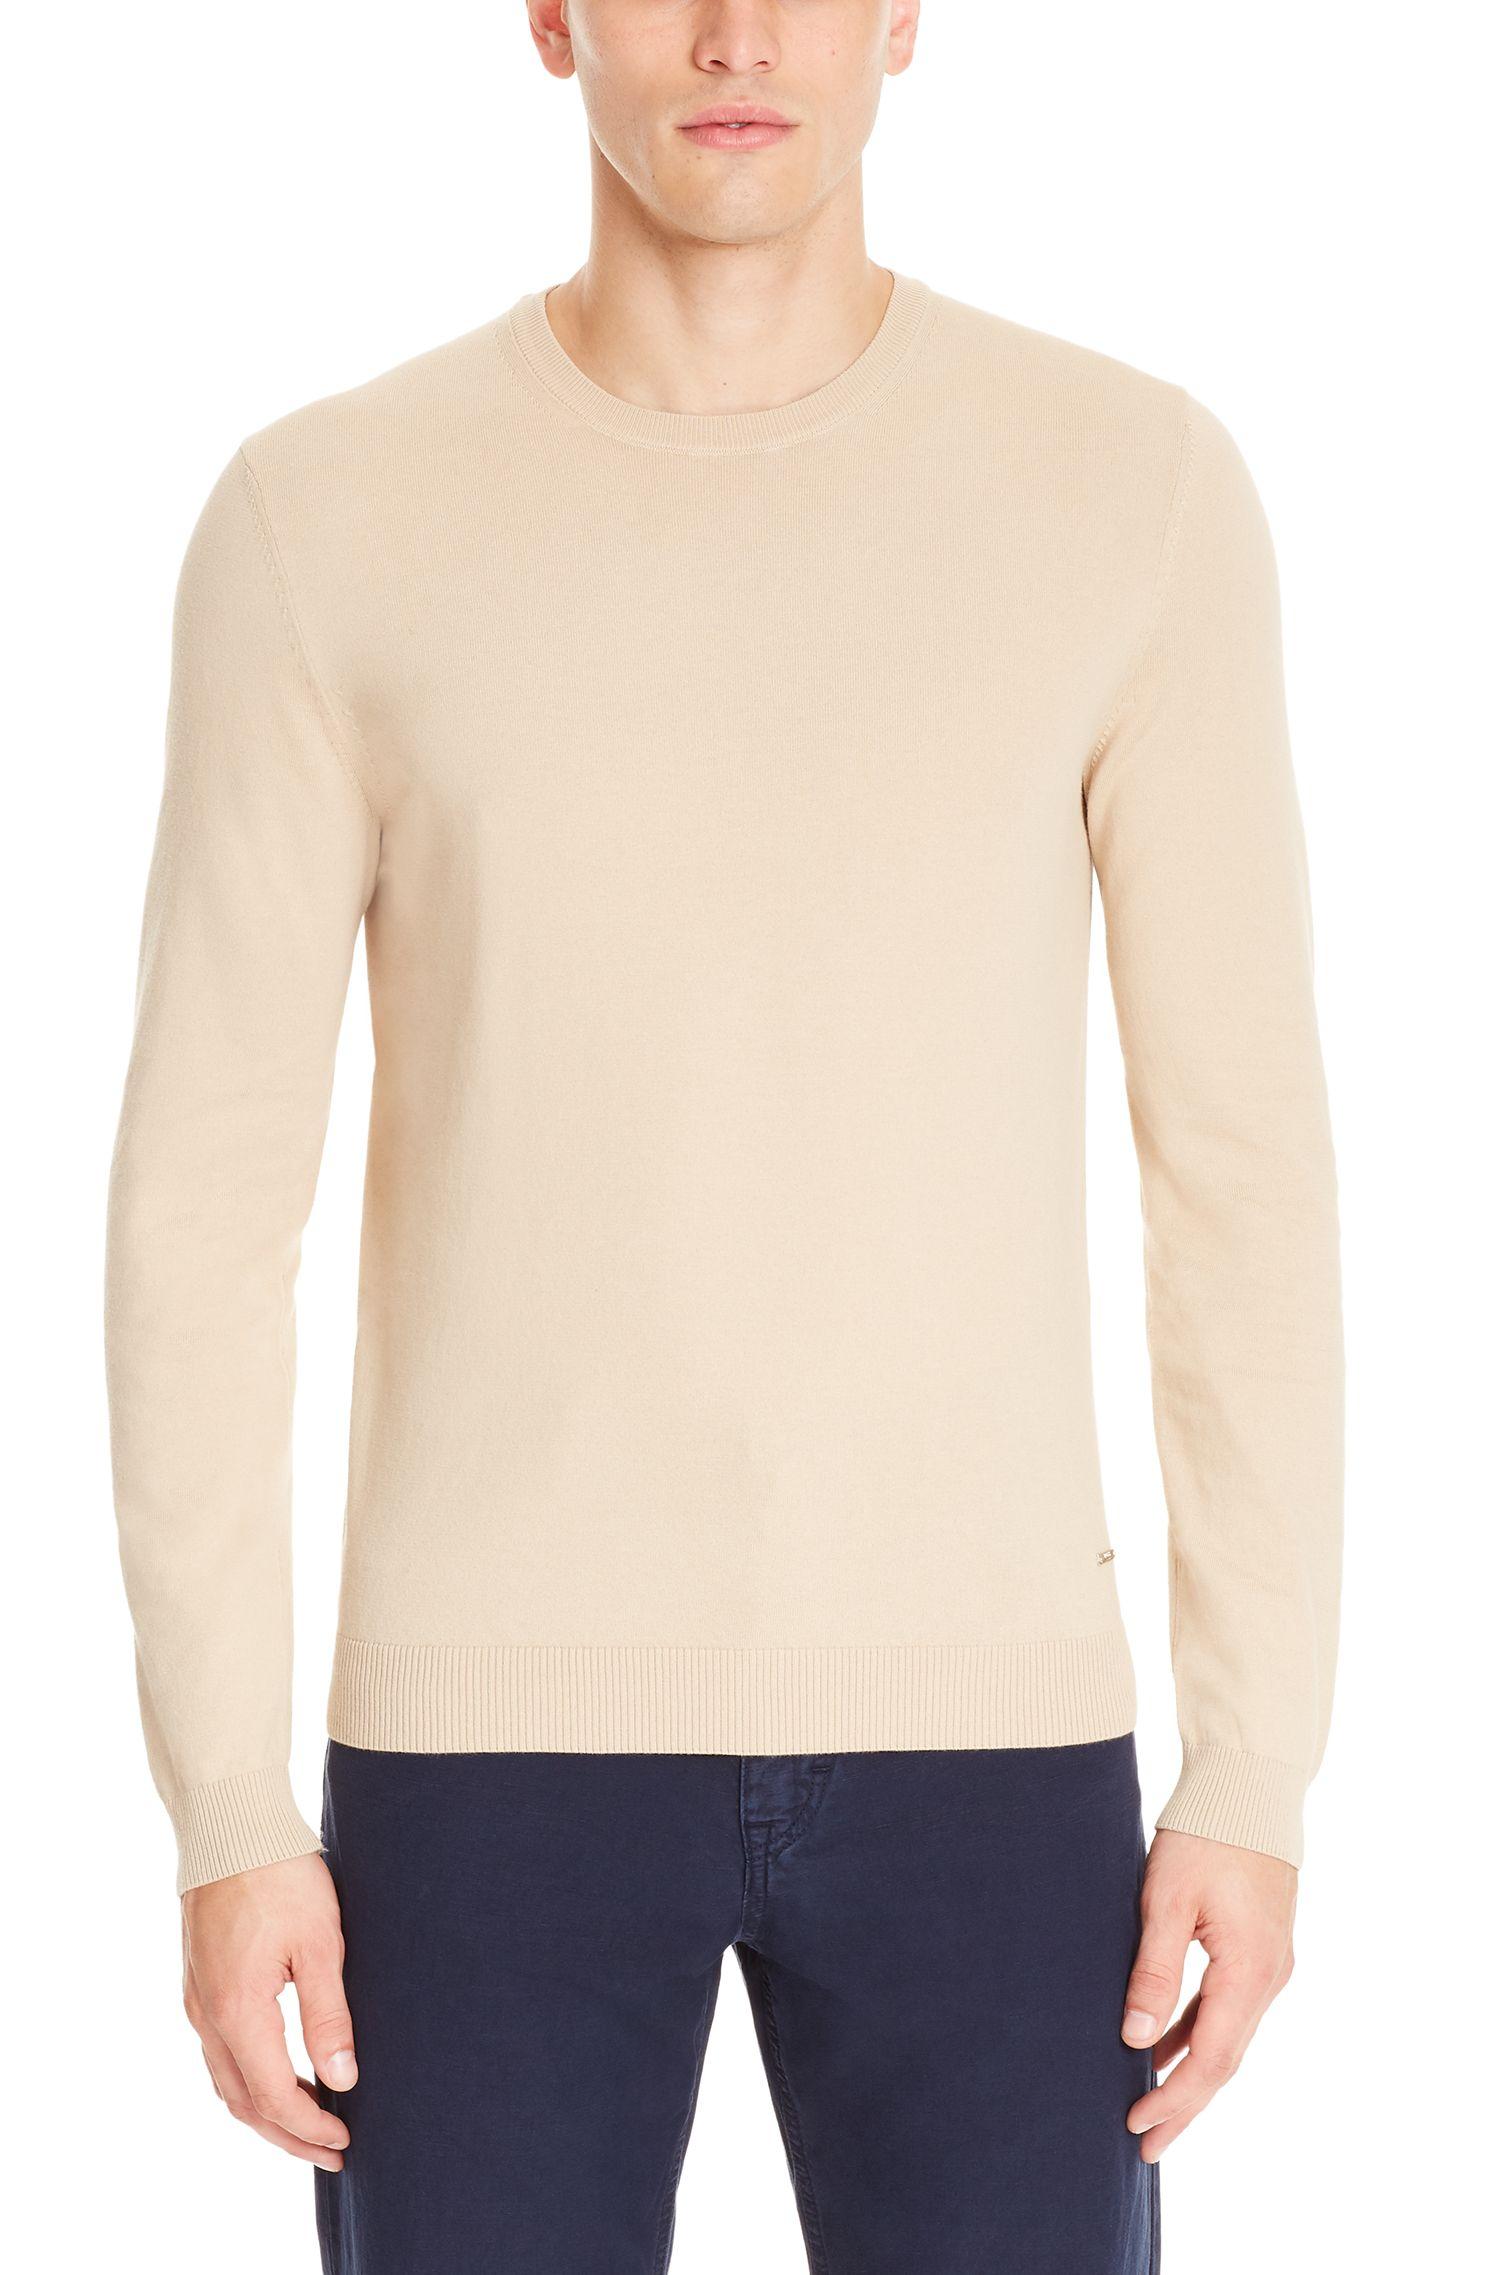 'Fabello O' | Cotton Sweater